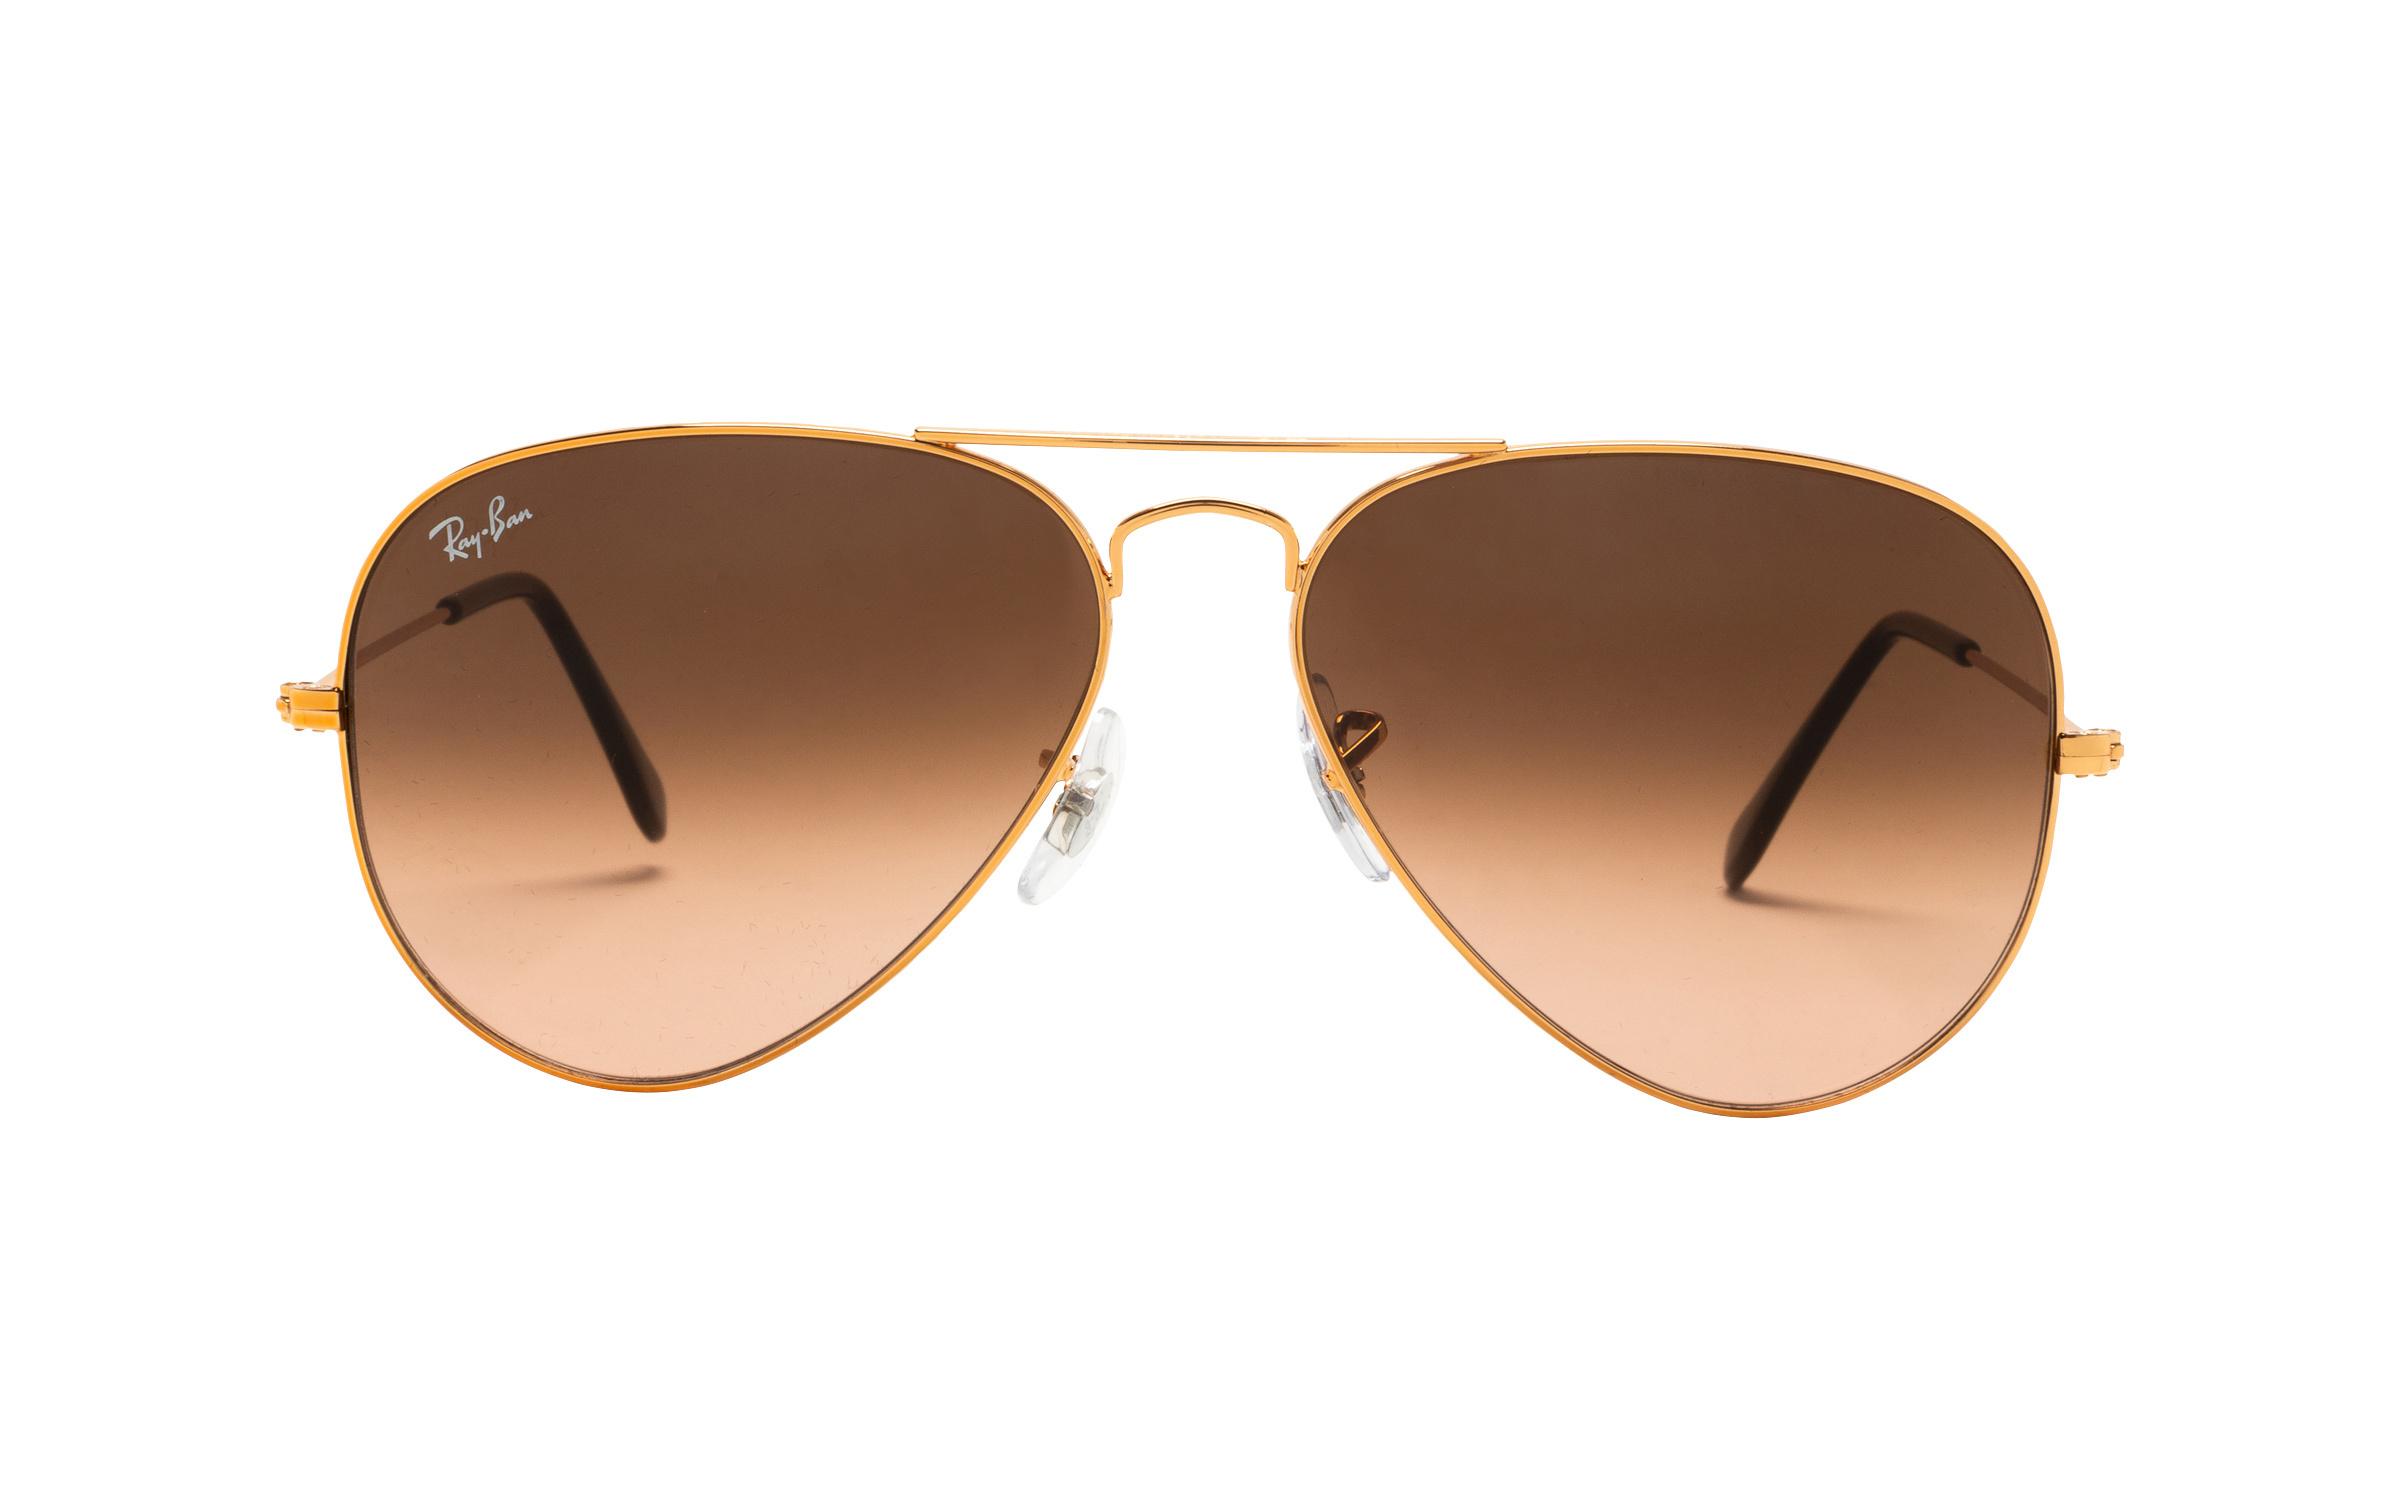 coastal.com - RayBan Ray-Ban RB3025 9001A5 Shiny Light Bronze 58 Sunglasses in Brown | Plastic – Online Coastal 157.00 USD